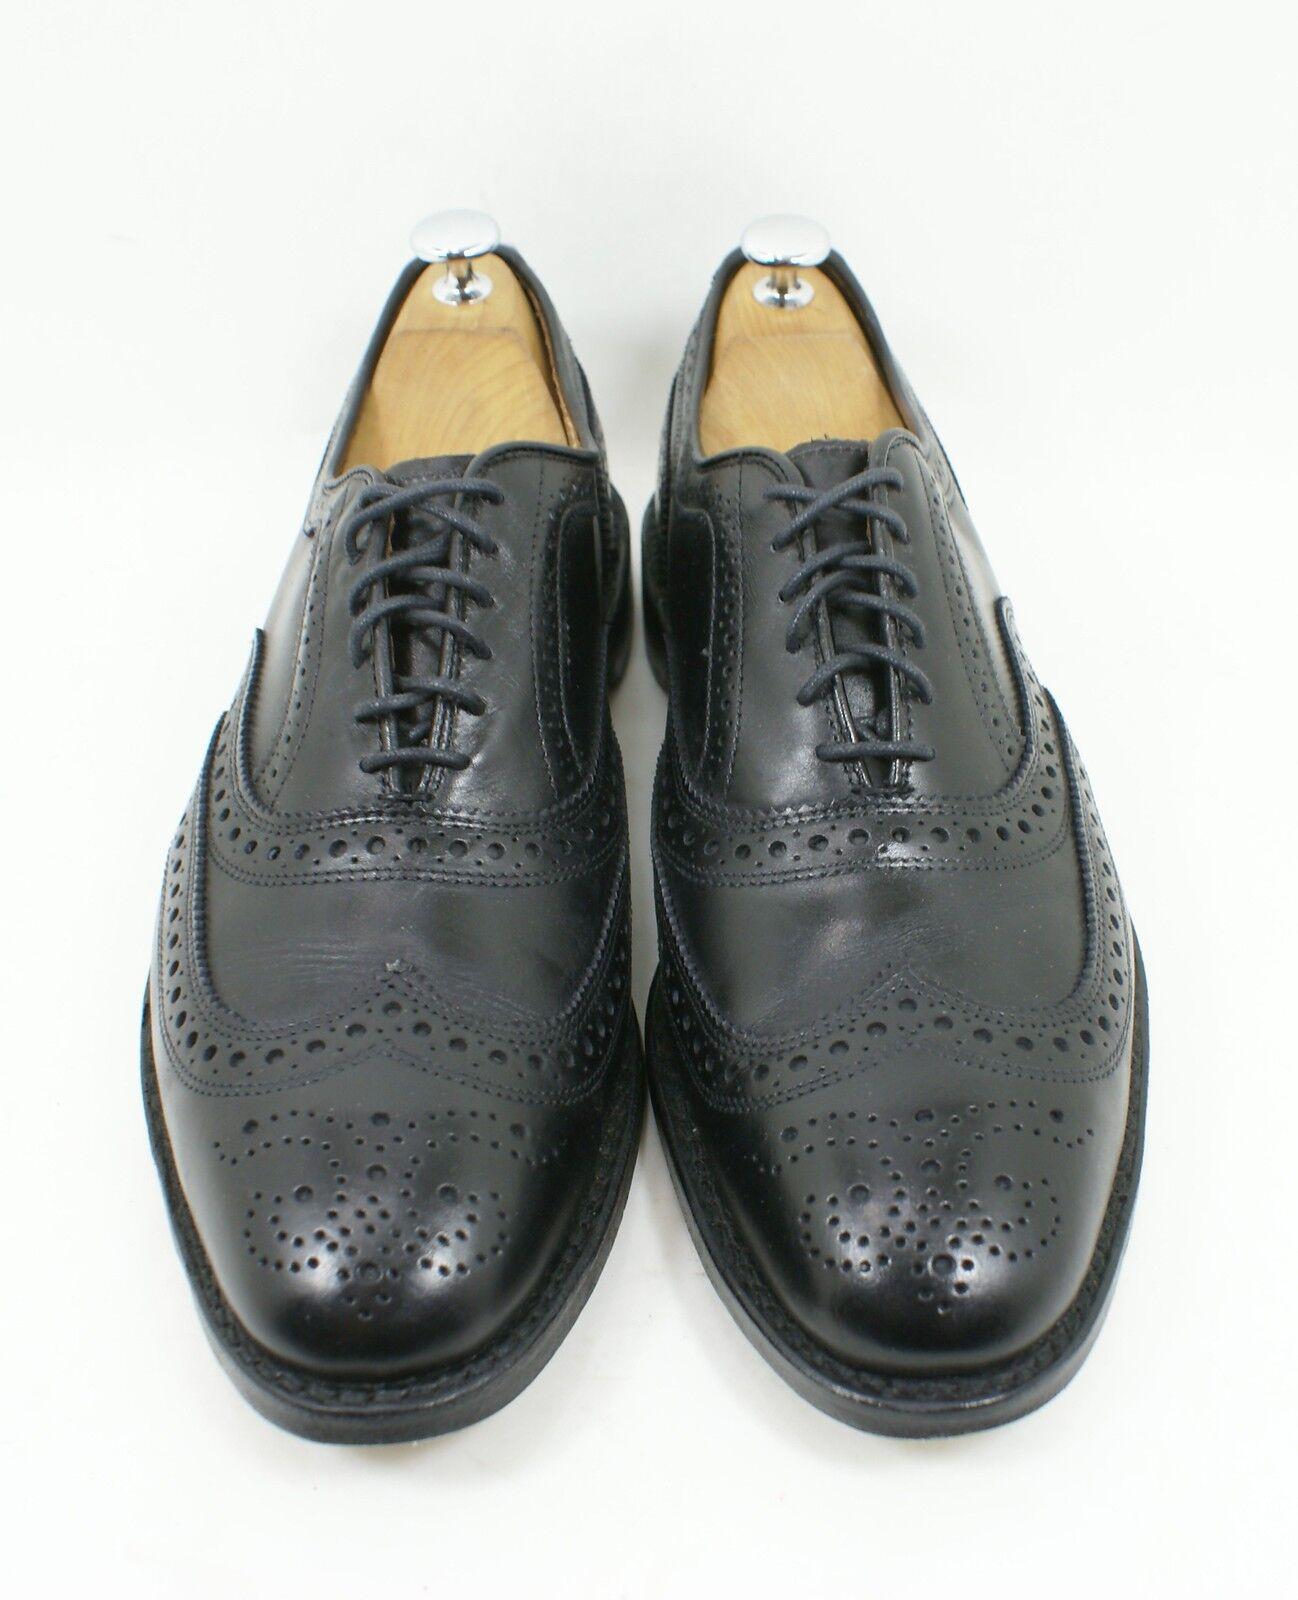 Allen Edmonds 'McAllister' Oxford nero Leather Dimensione 10.5 10.5 10.5 D Made In USA 824f60